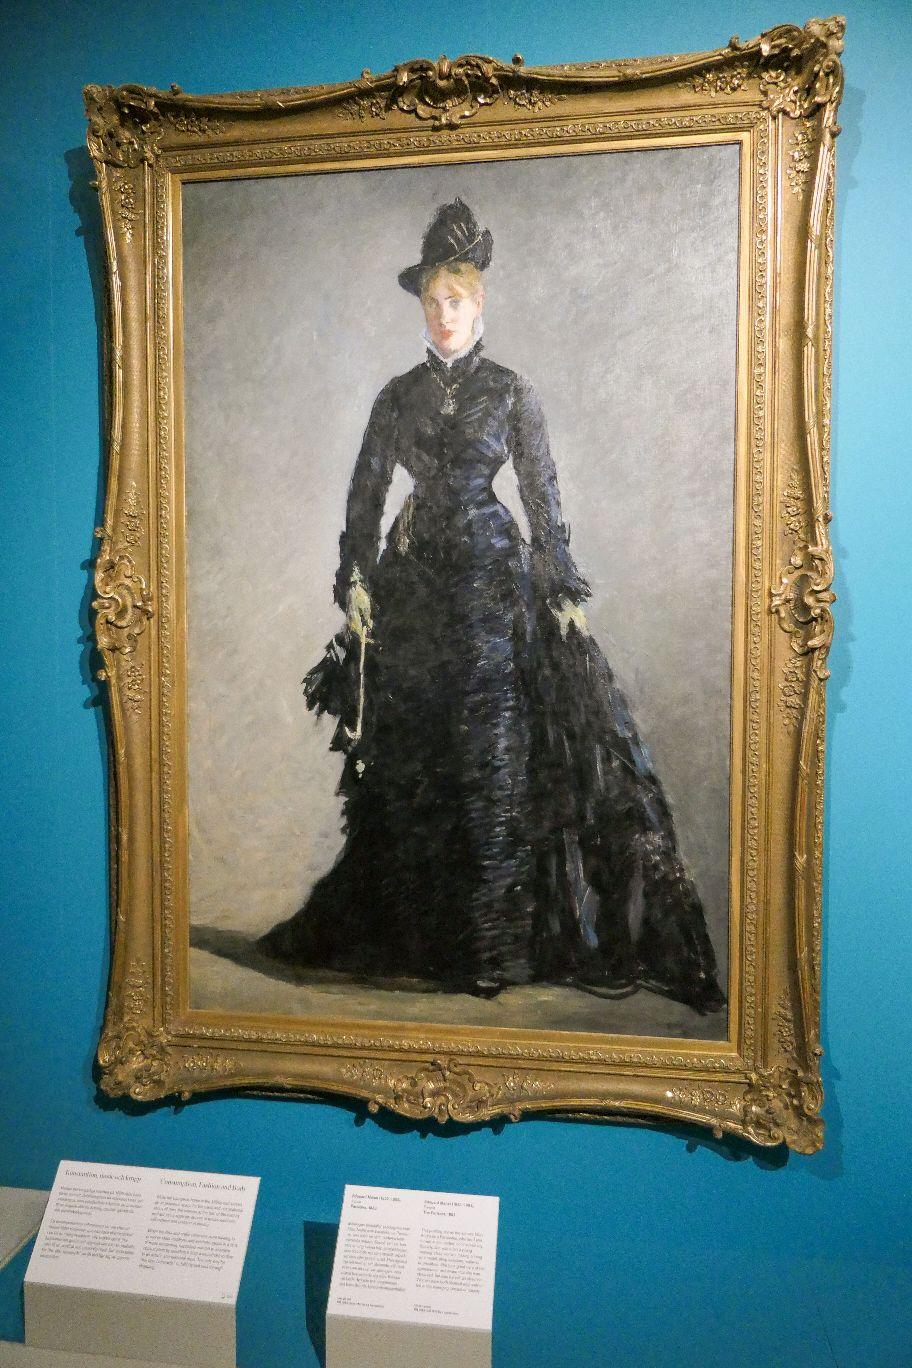 Stockholm Schweden Nationalmuseum Museum Kunst Gemälde Die Pariserin Edouard Manet